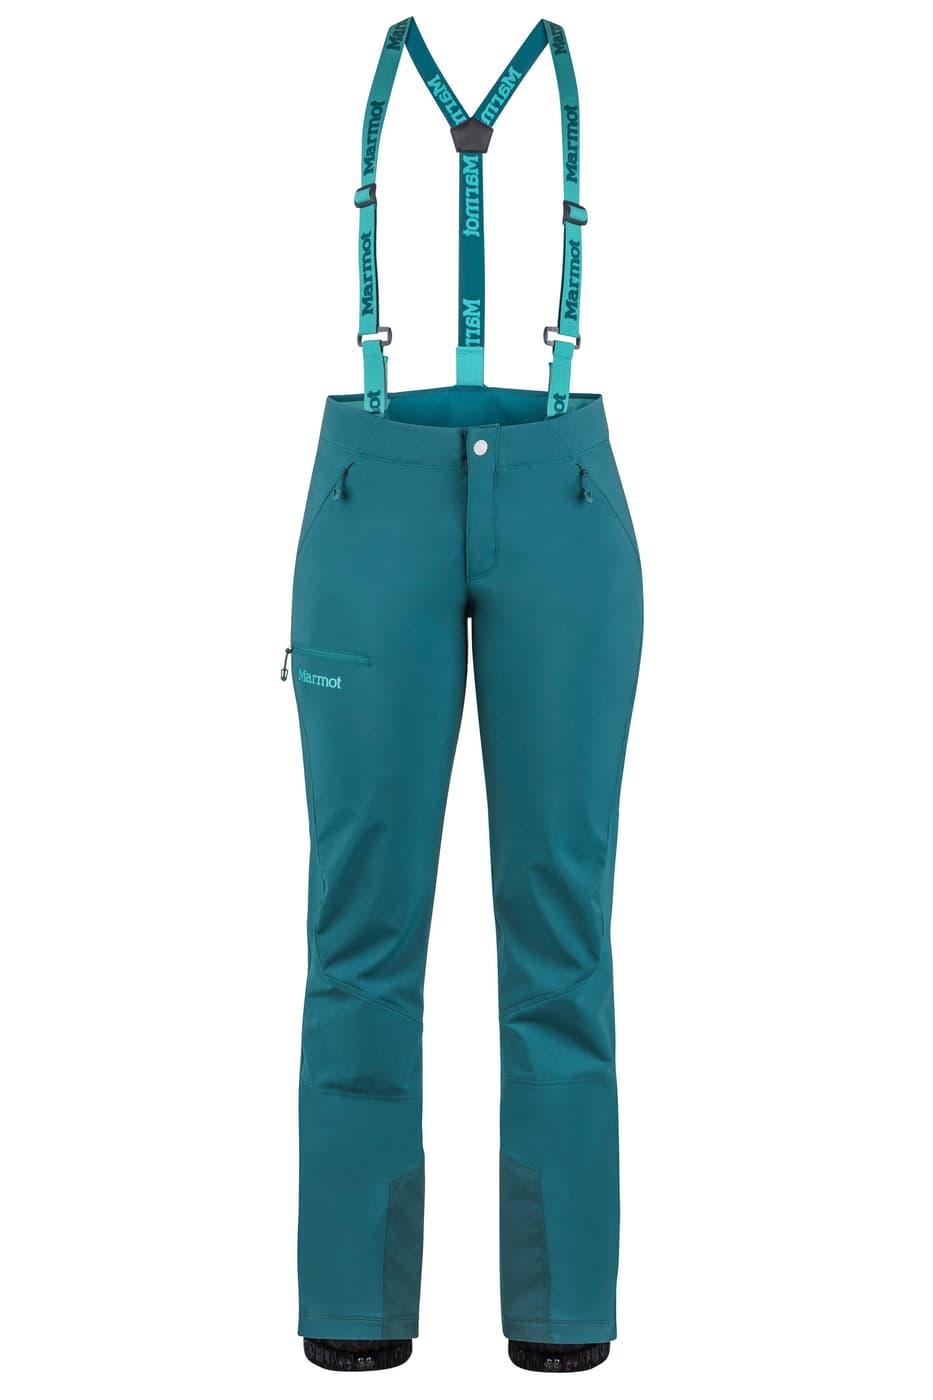 pensamientos sobre tienda de descuento nuevos estilos Marmot Pro Tour Pantalon de randonnée pour femme | Migros